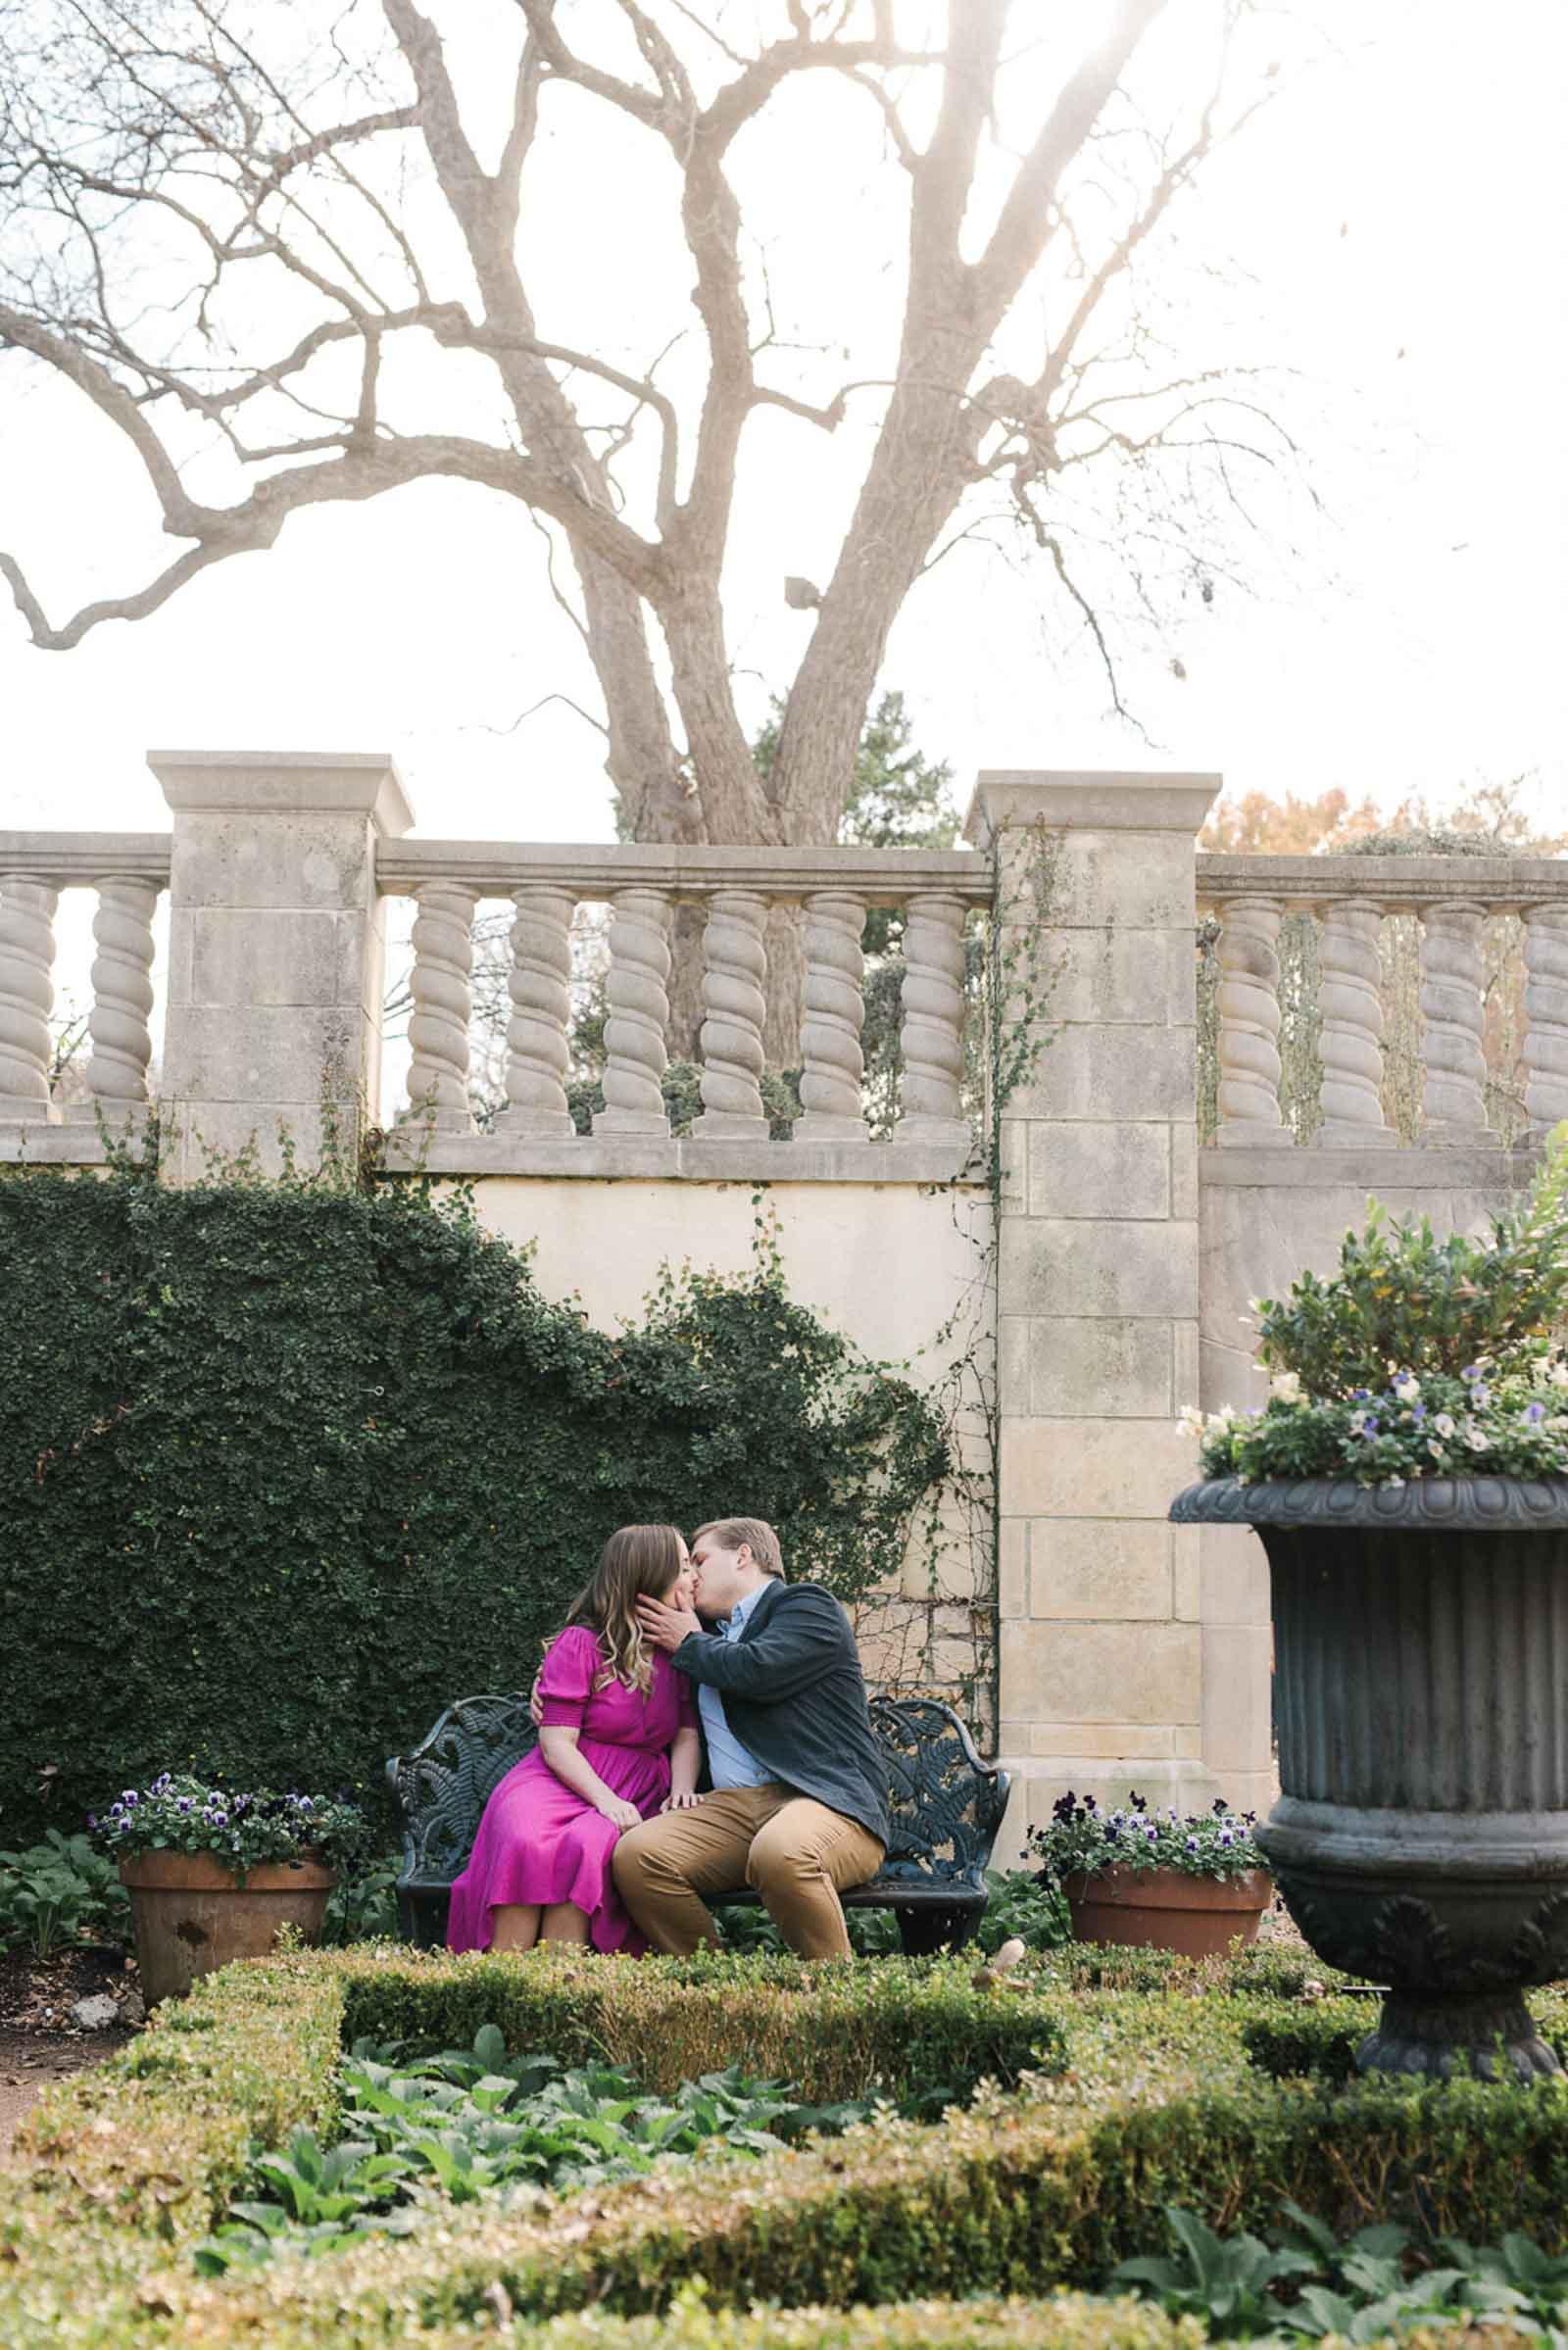 Dallas Arboretum Engagement-JenSymes-35.jpg